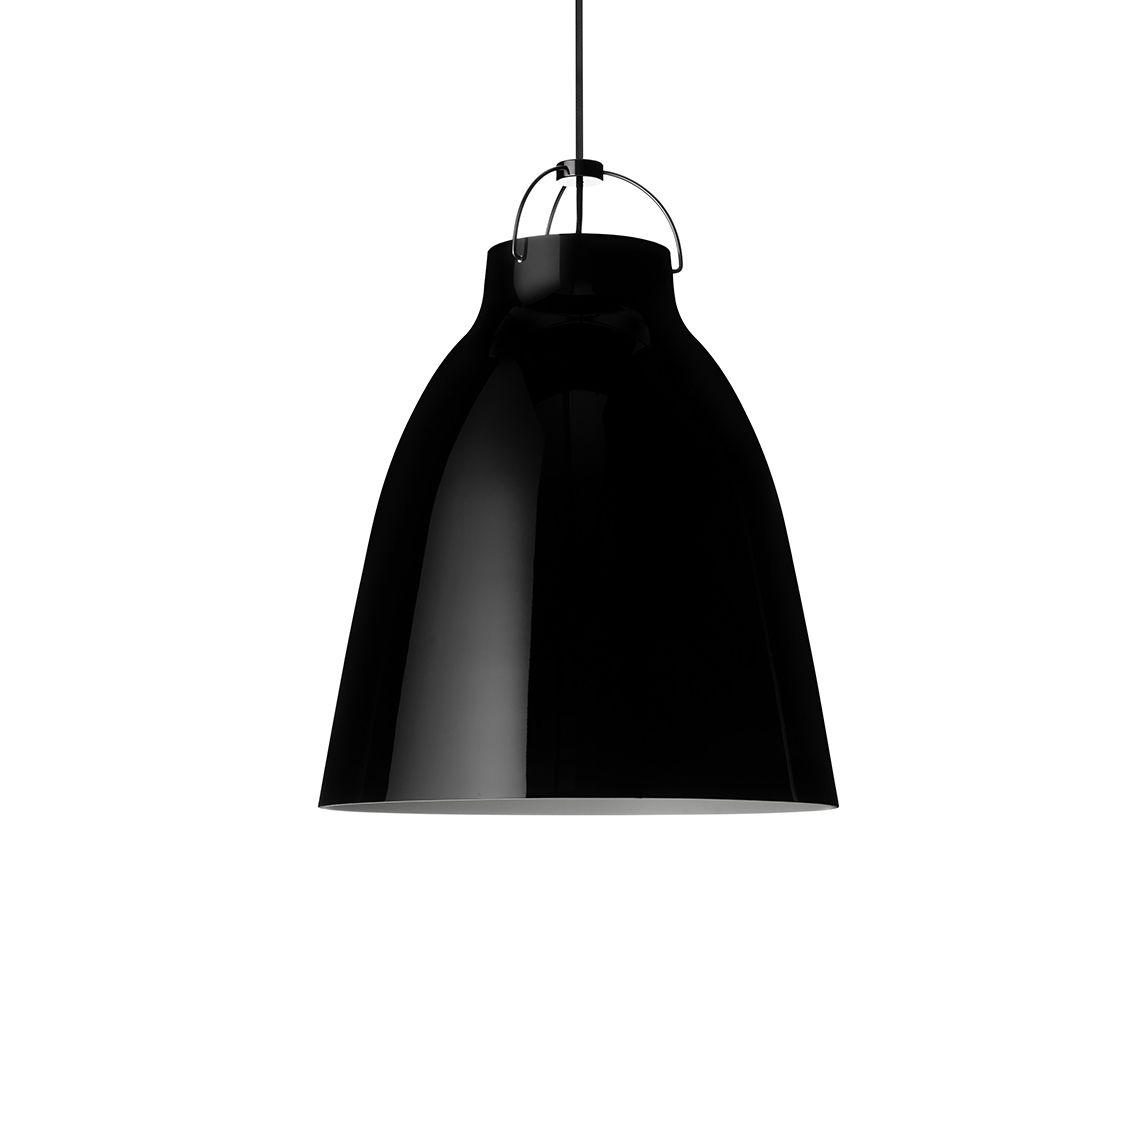 Caravaggio hanglamp Lightyears Ø16 hoogglans zwart